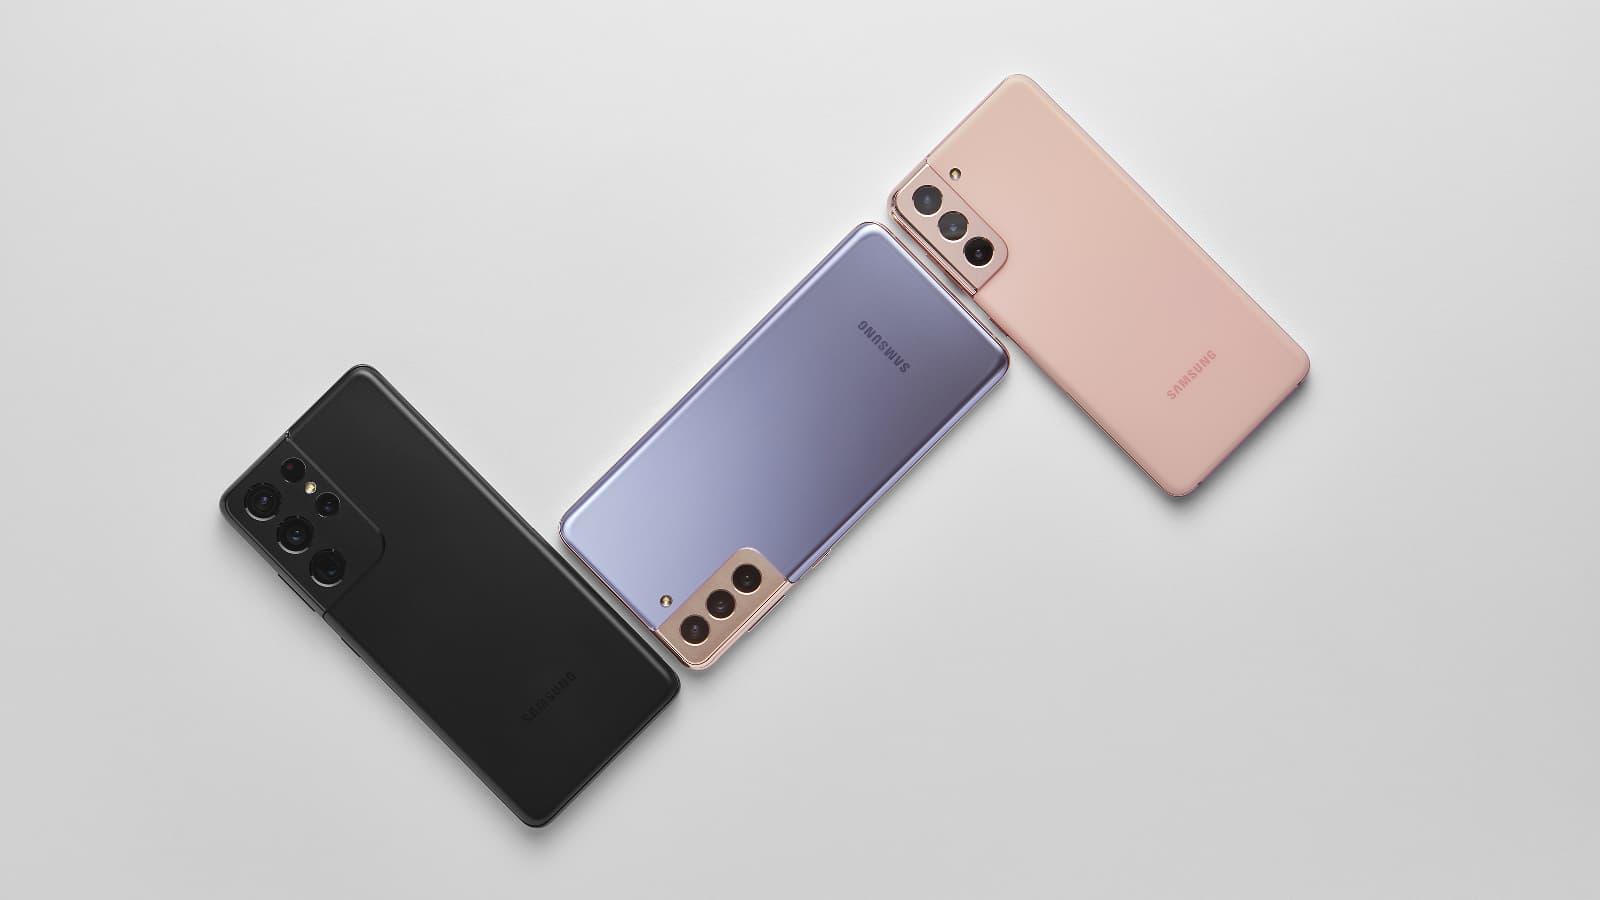 Le Galaxy S21 est disponible chez SFR